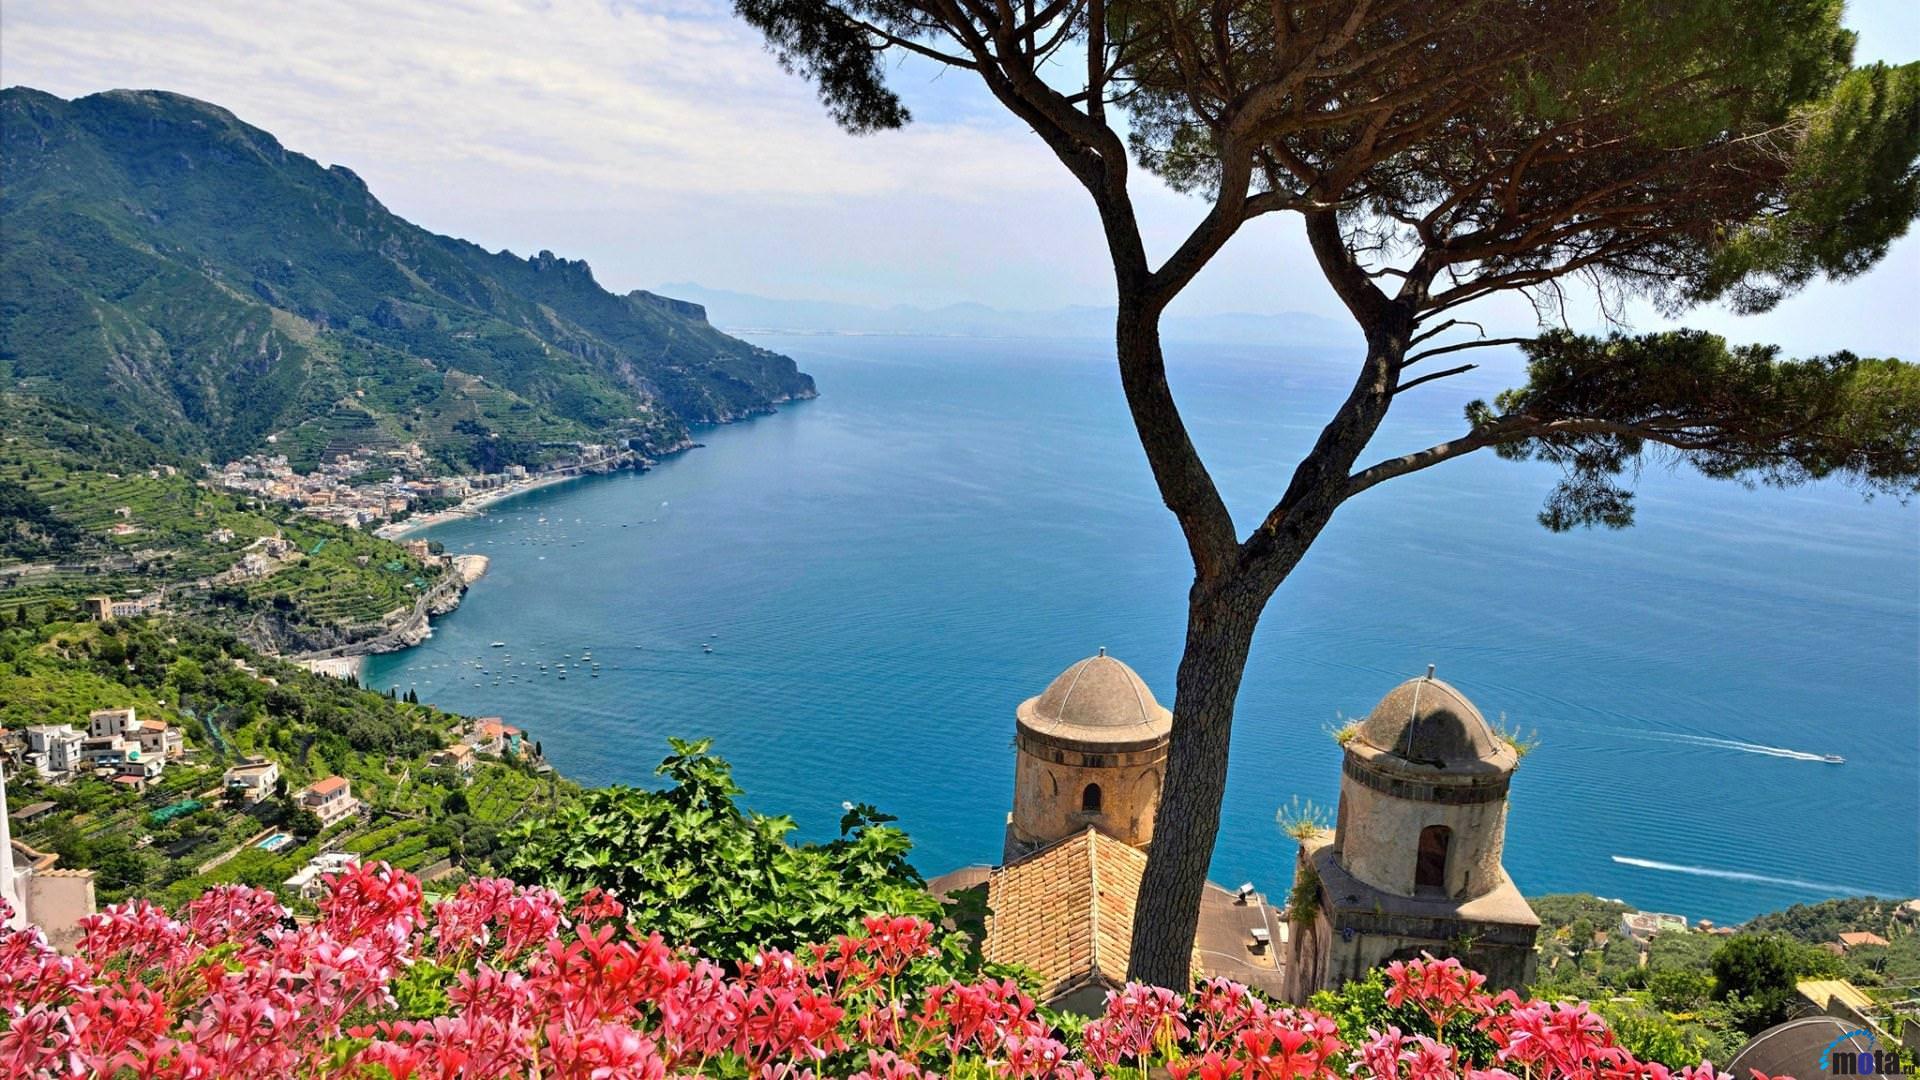 Amalfi Wallpapers Top Free Amalfi Backgrounds Wallpaperaccess